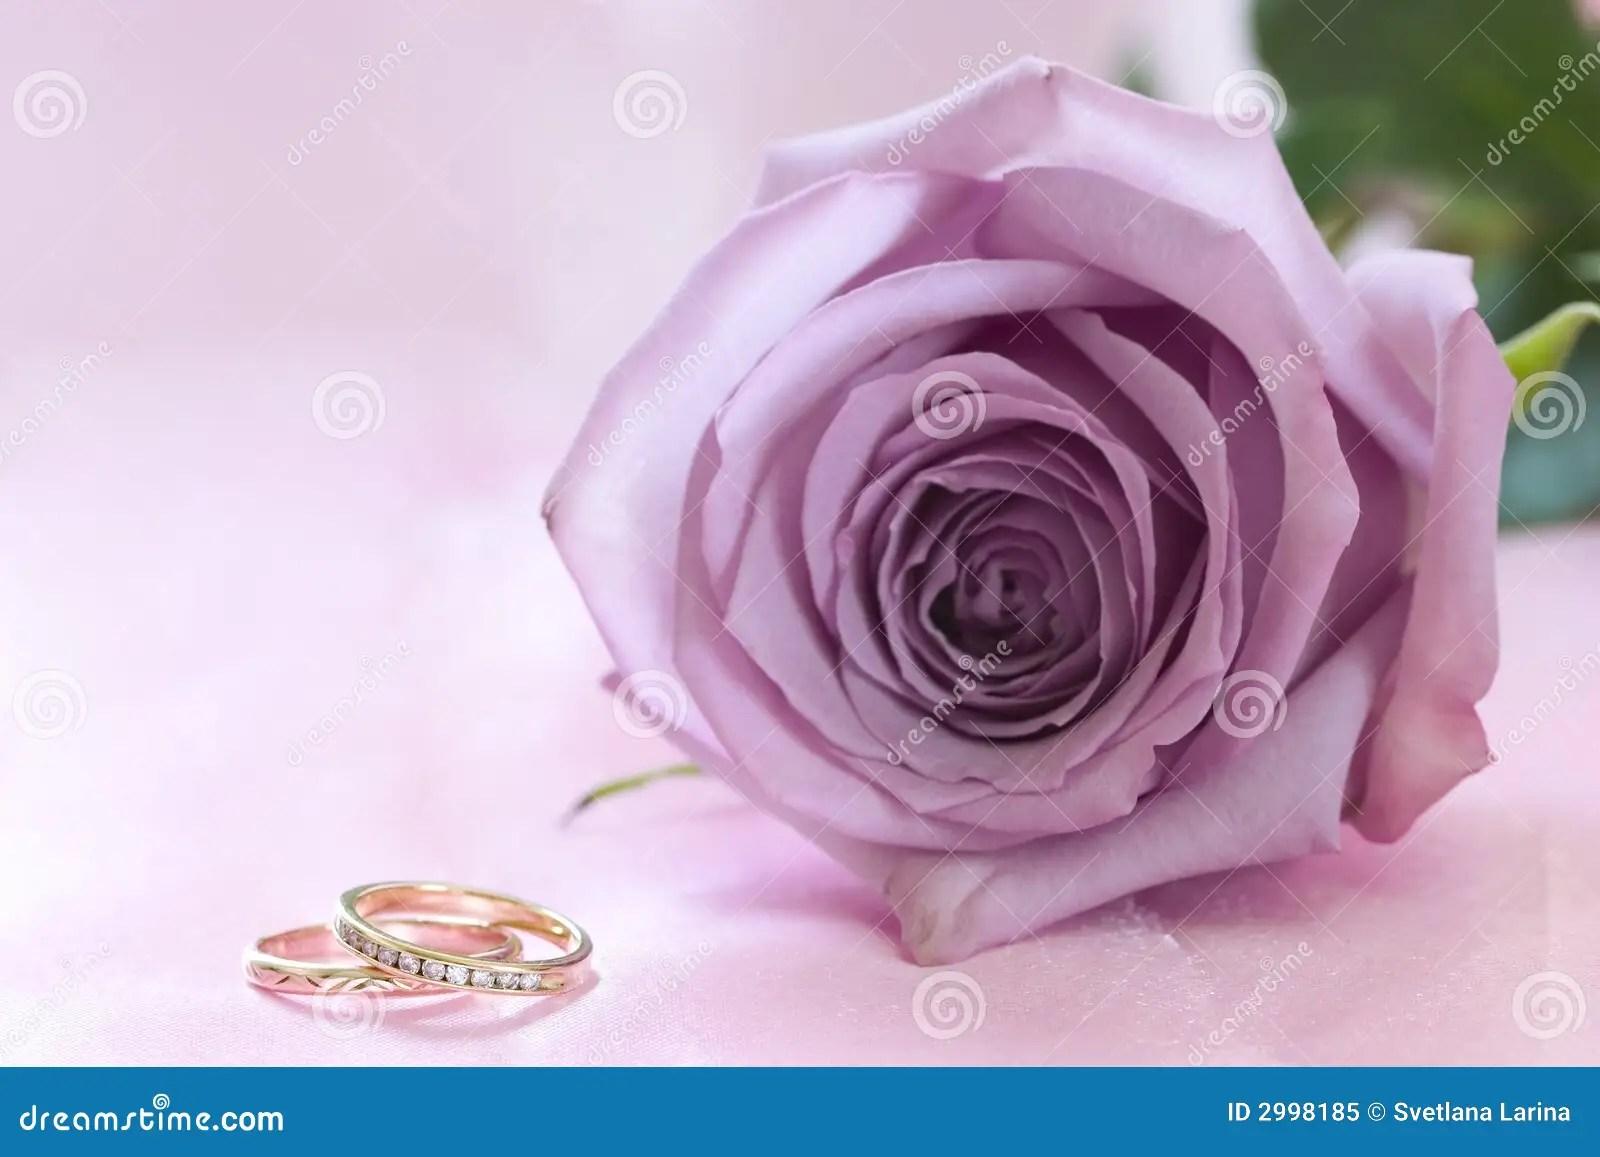 royalty free stock photo purple rose wedding rings image rose wedding ring Purple rose and wedding rings